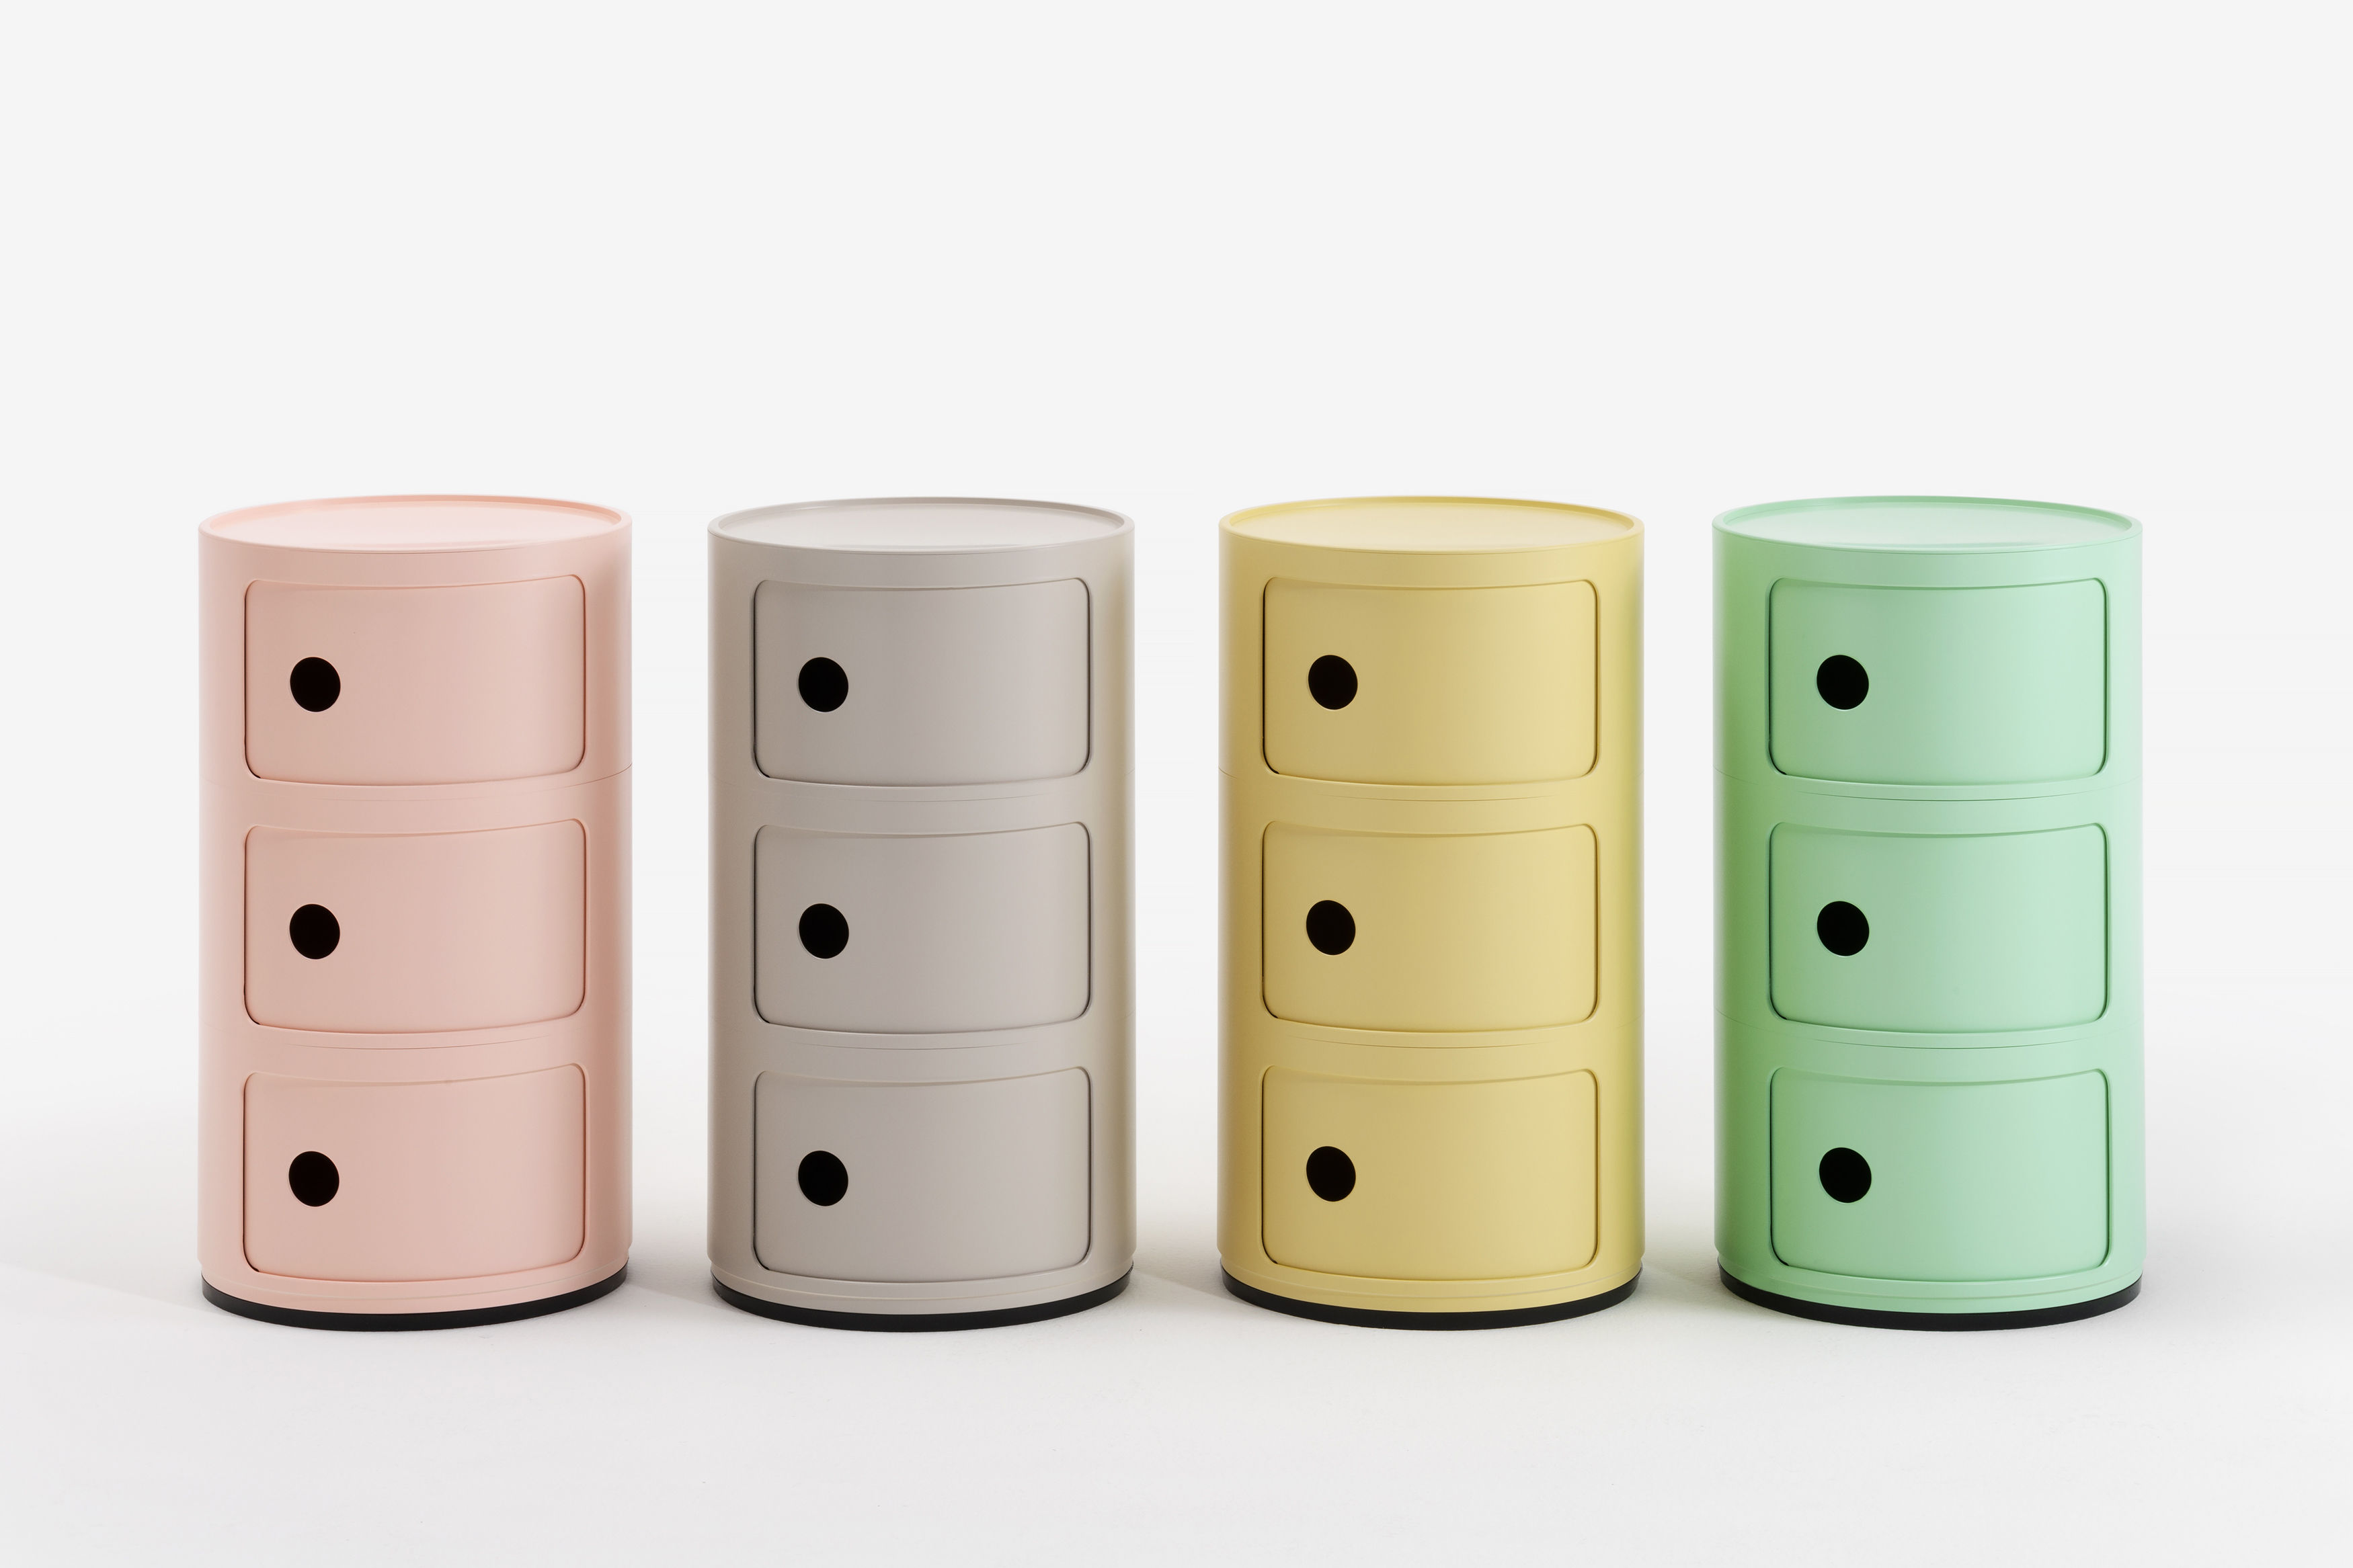 Table De Chevet Componibili rangement componibili bio / 3 tiroirs - matériau naturel